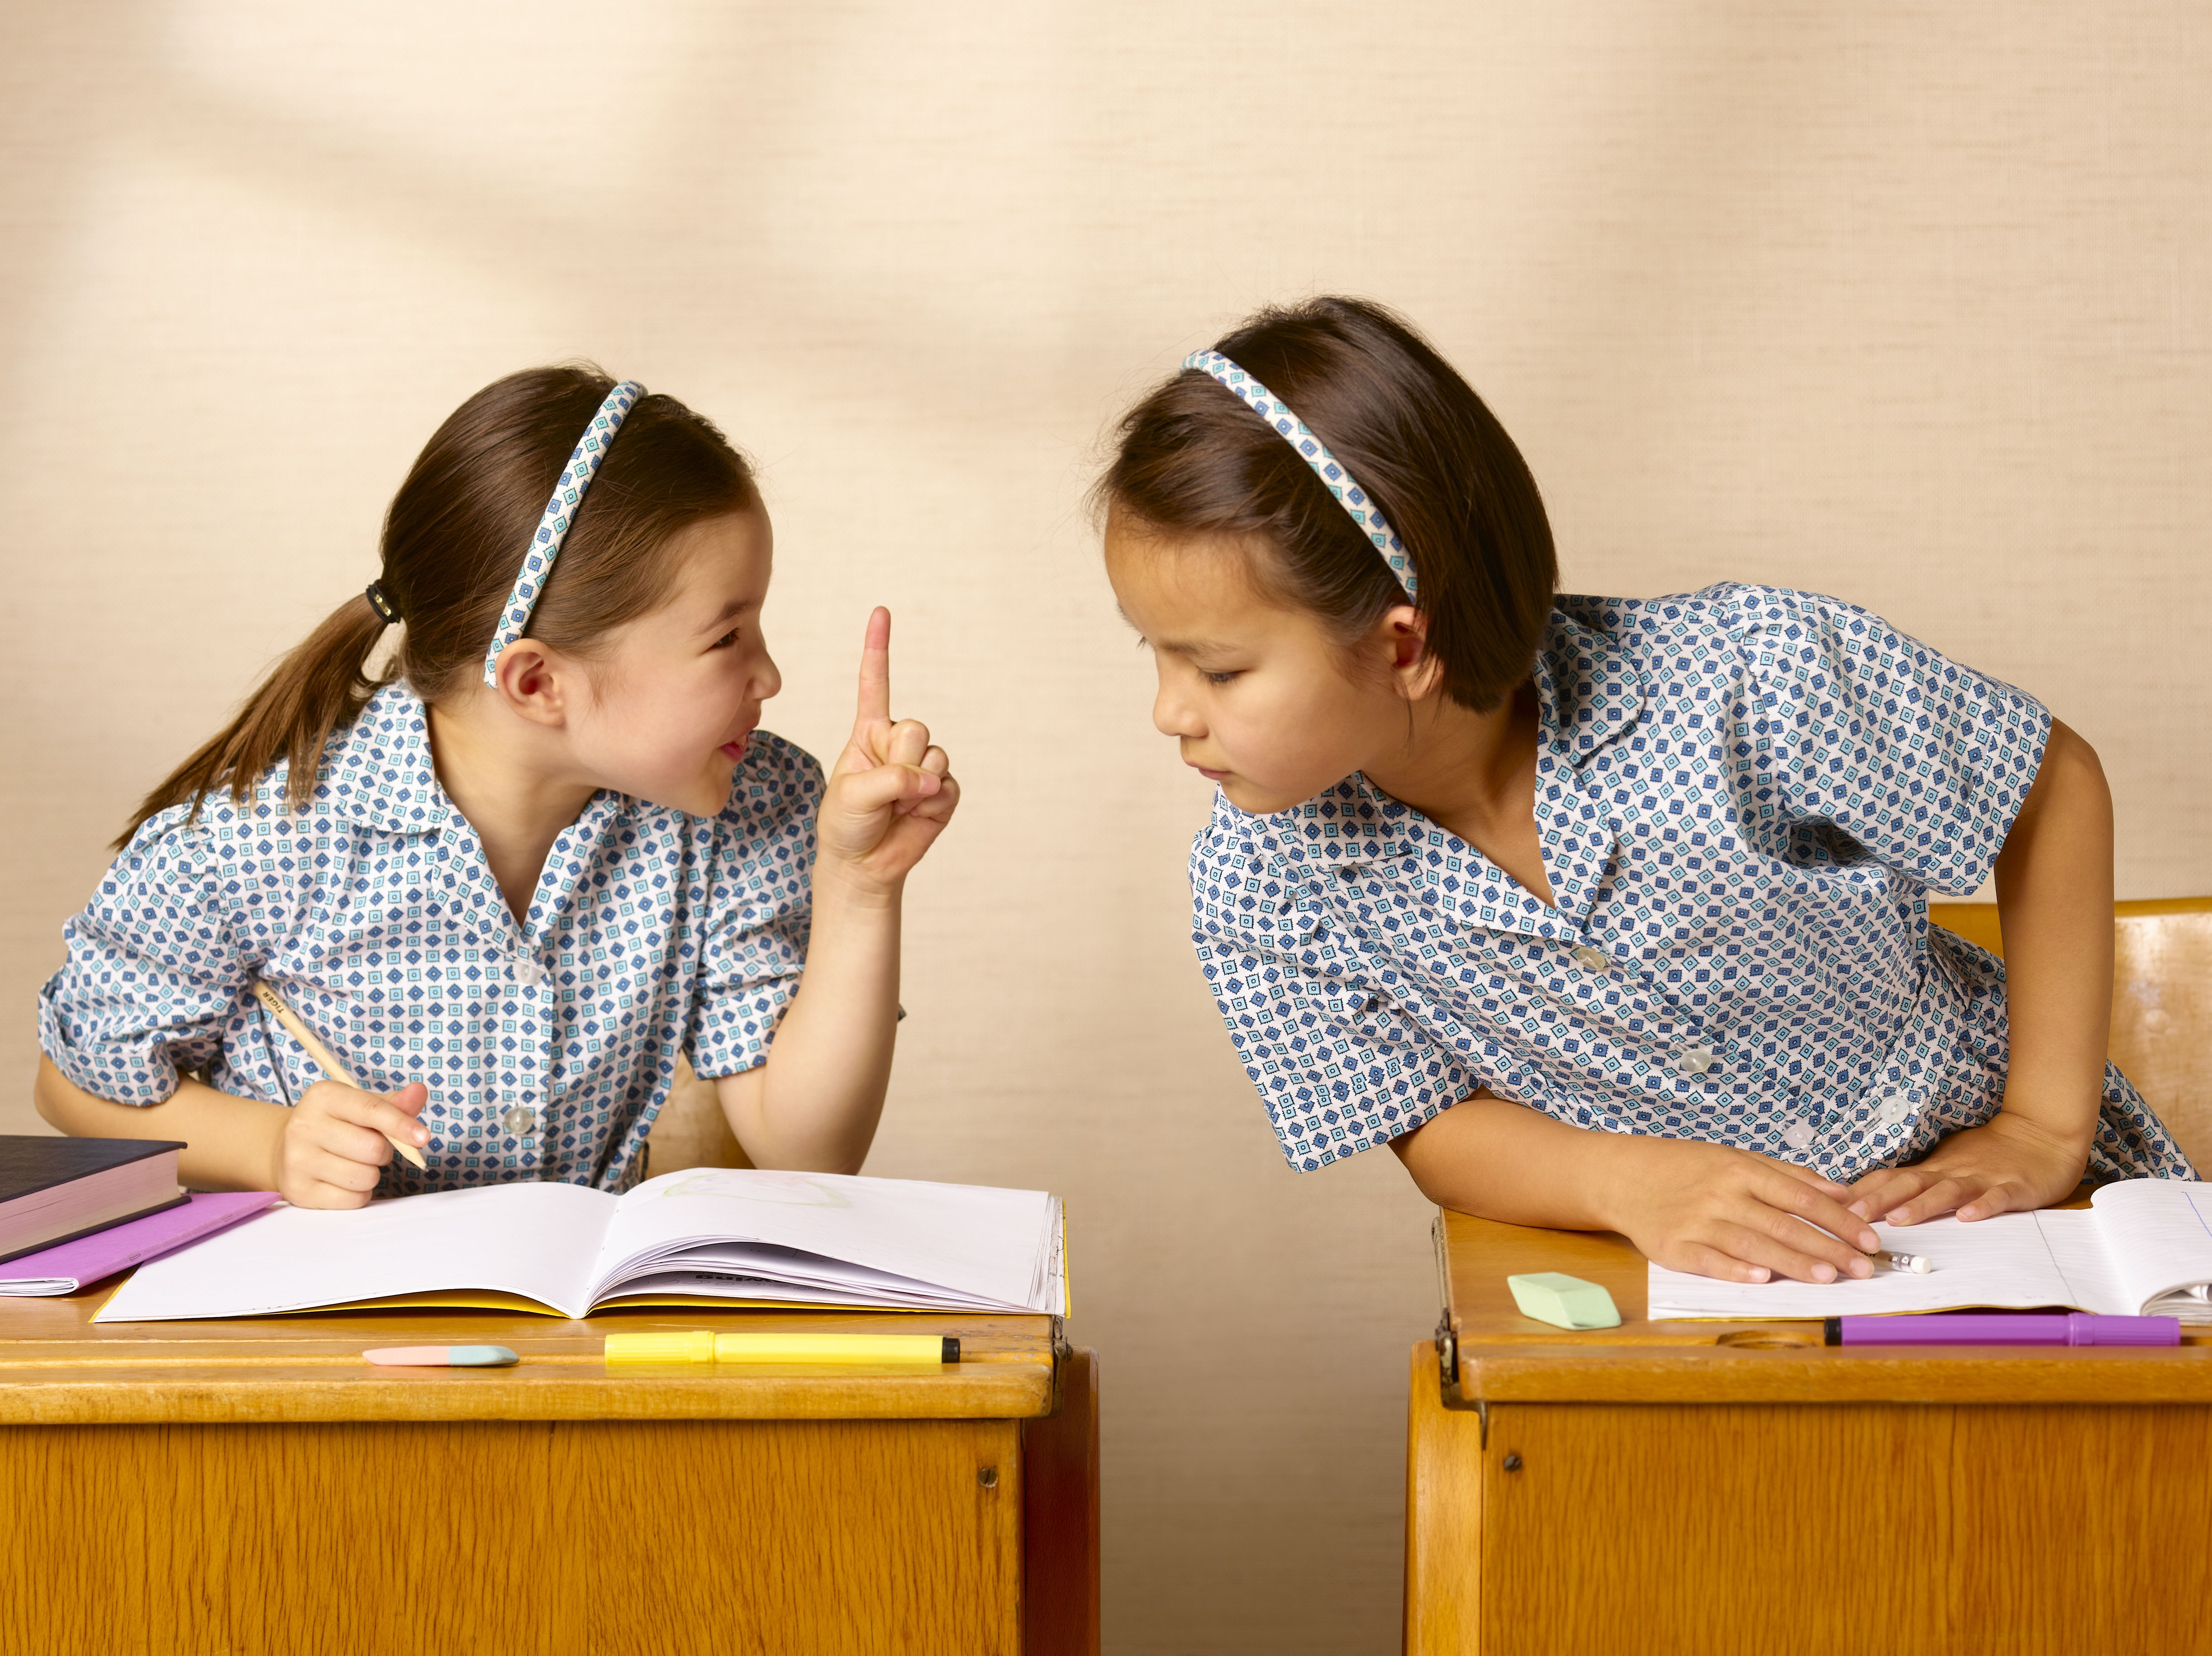 School girl telling neighbor not to cheat/copy